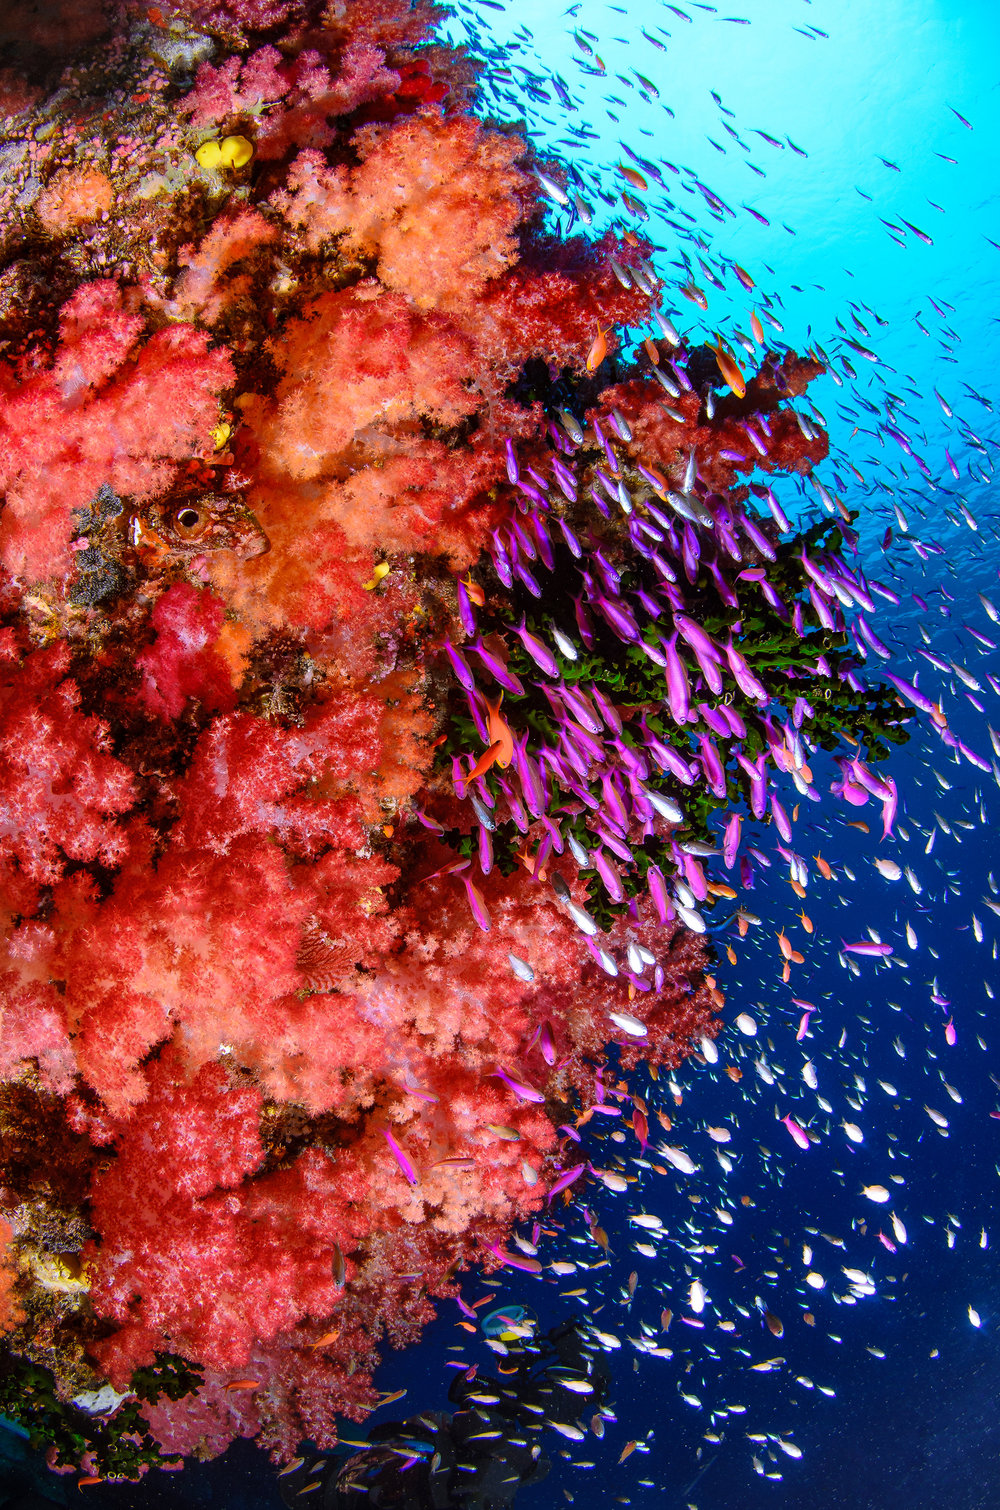 DOWNLOAD   -Taveuni, Fiji CREDIT: YEN-YI LEE